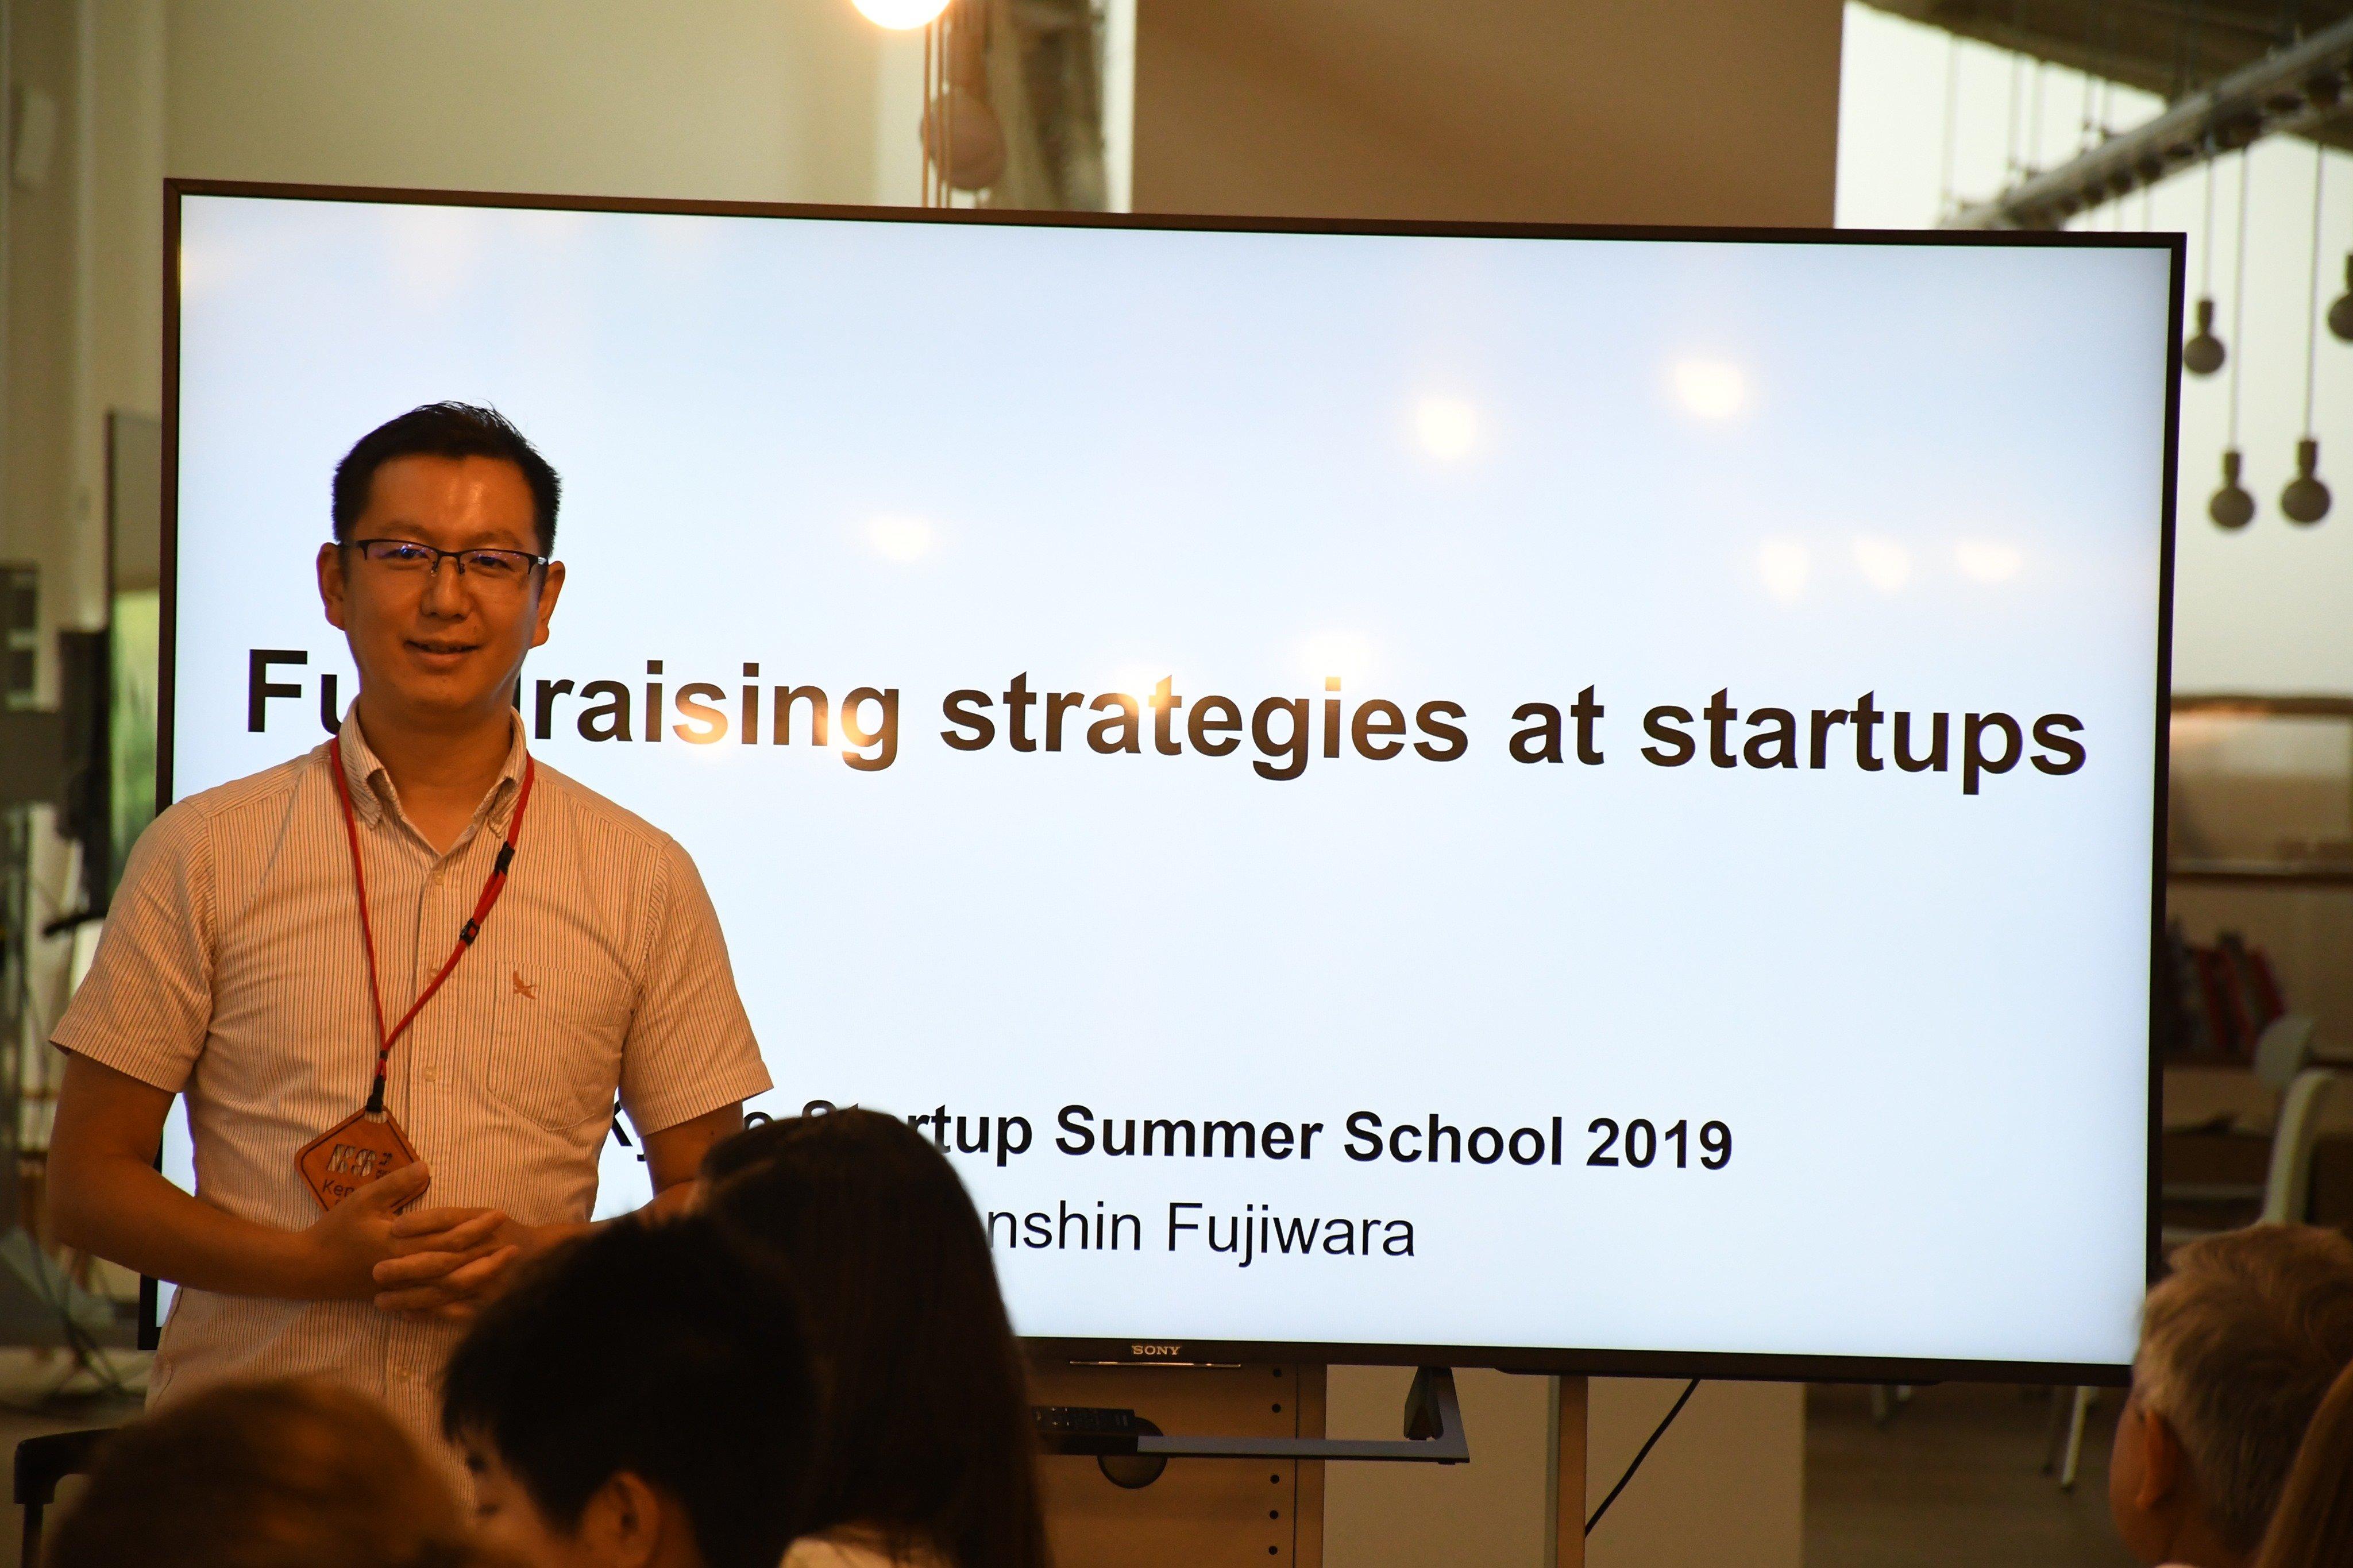 Hacarus CEO Kenshin Fujiwara At Kyoto Start-Up Summer School